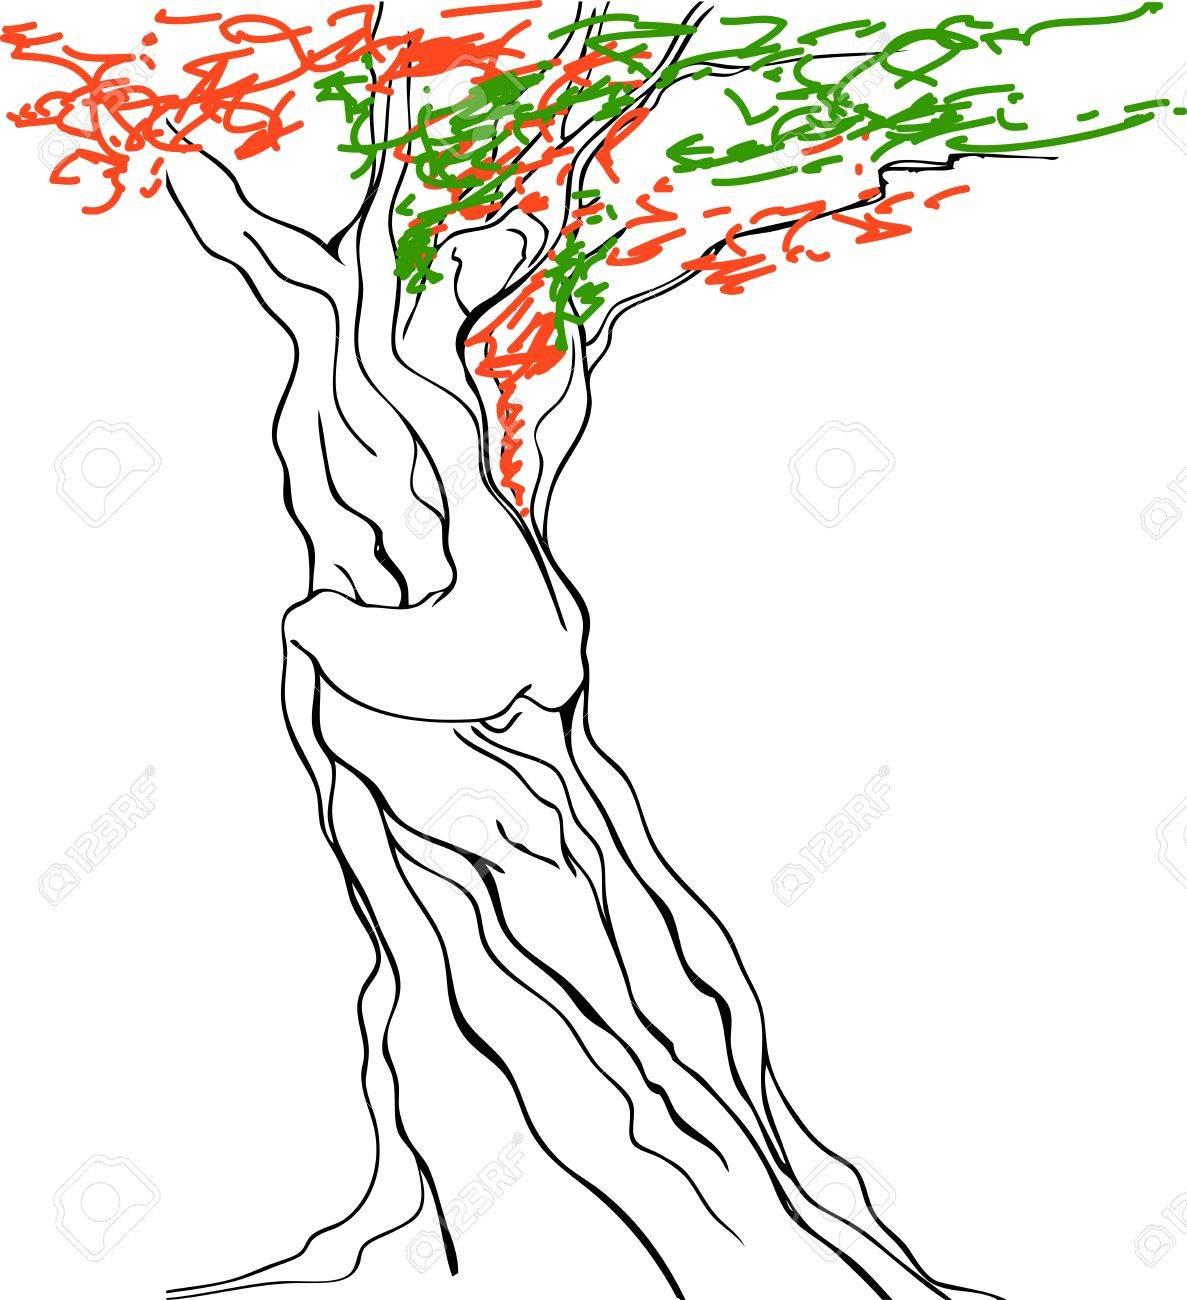 Erotic tree Stock Vector - 15570581